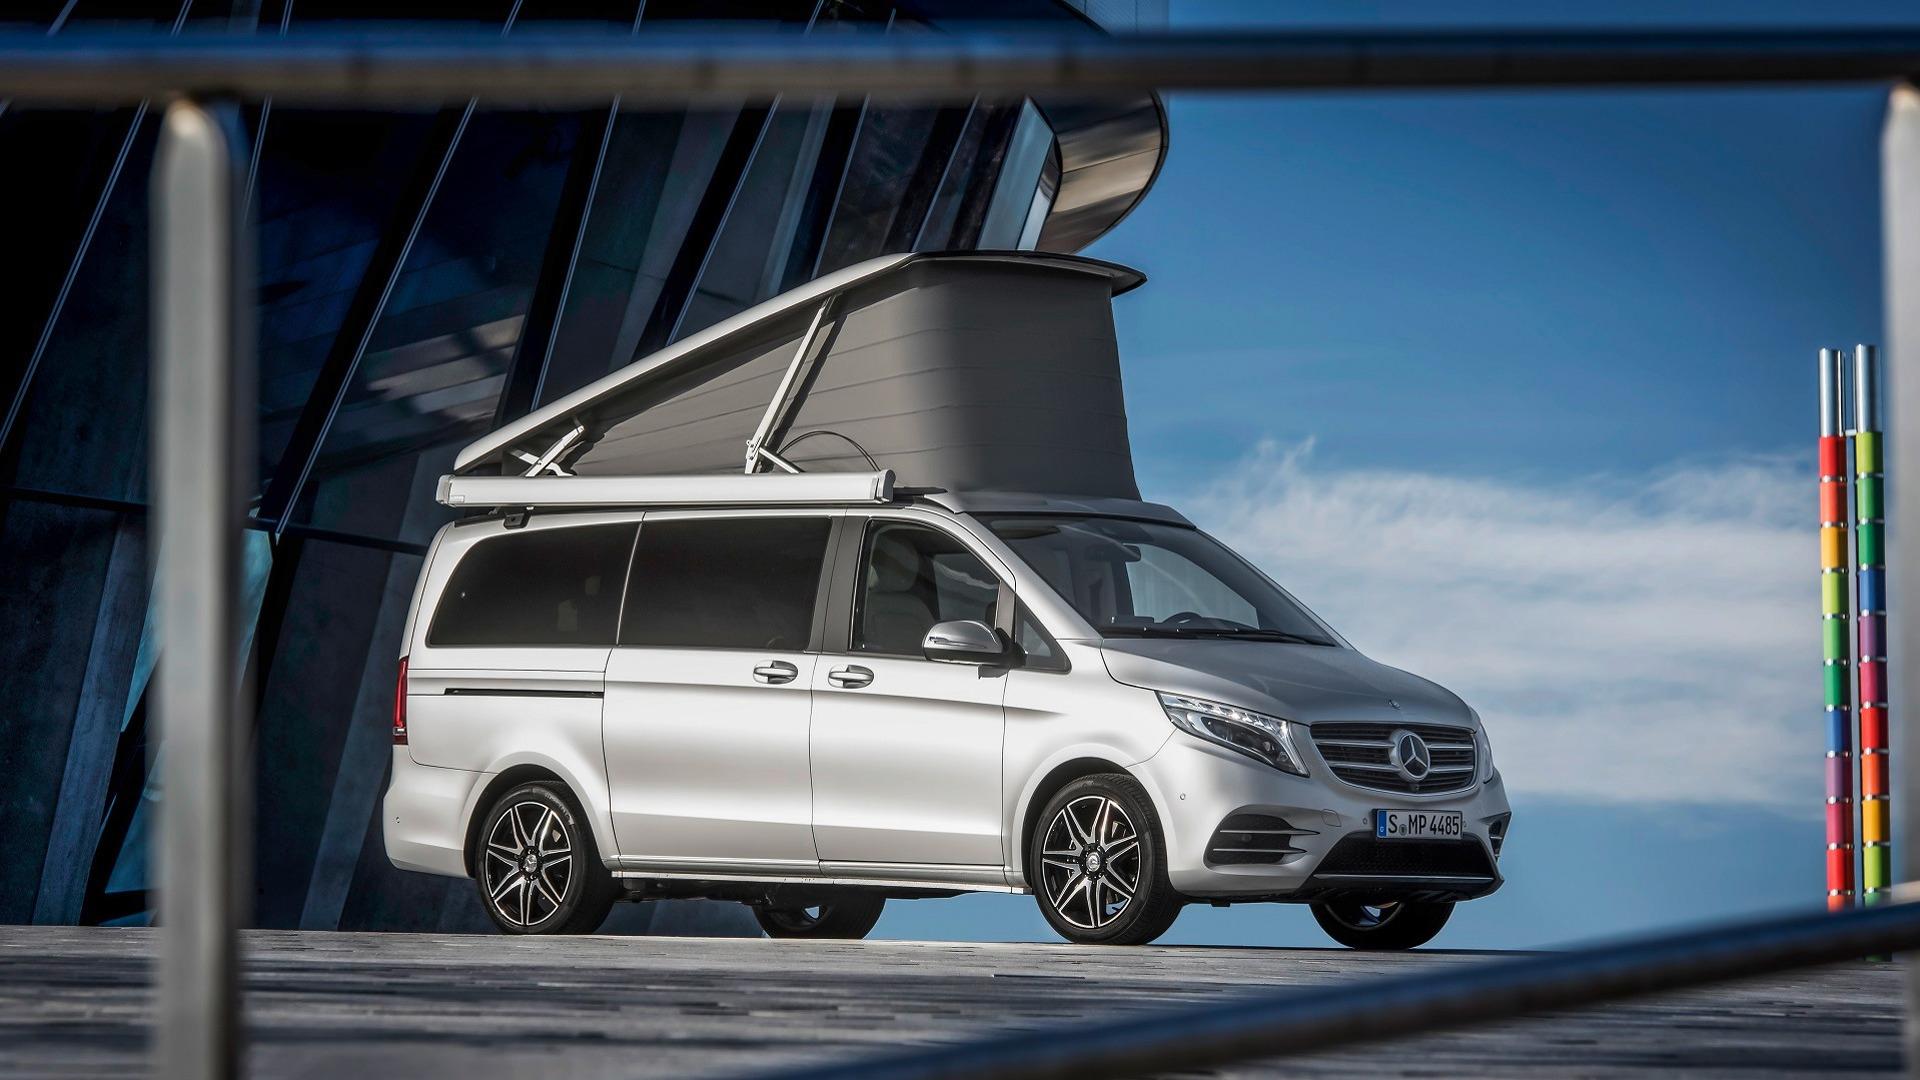 Mercedes Marco Polo >> Posh Mercedes Marco Polo Camper Has Yacht Wood Floors